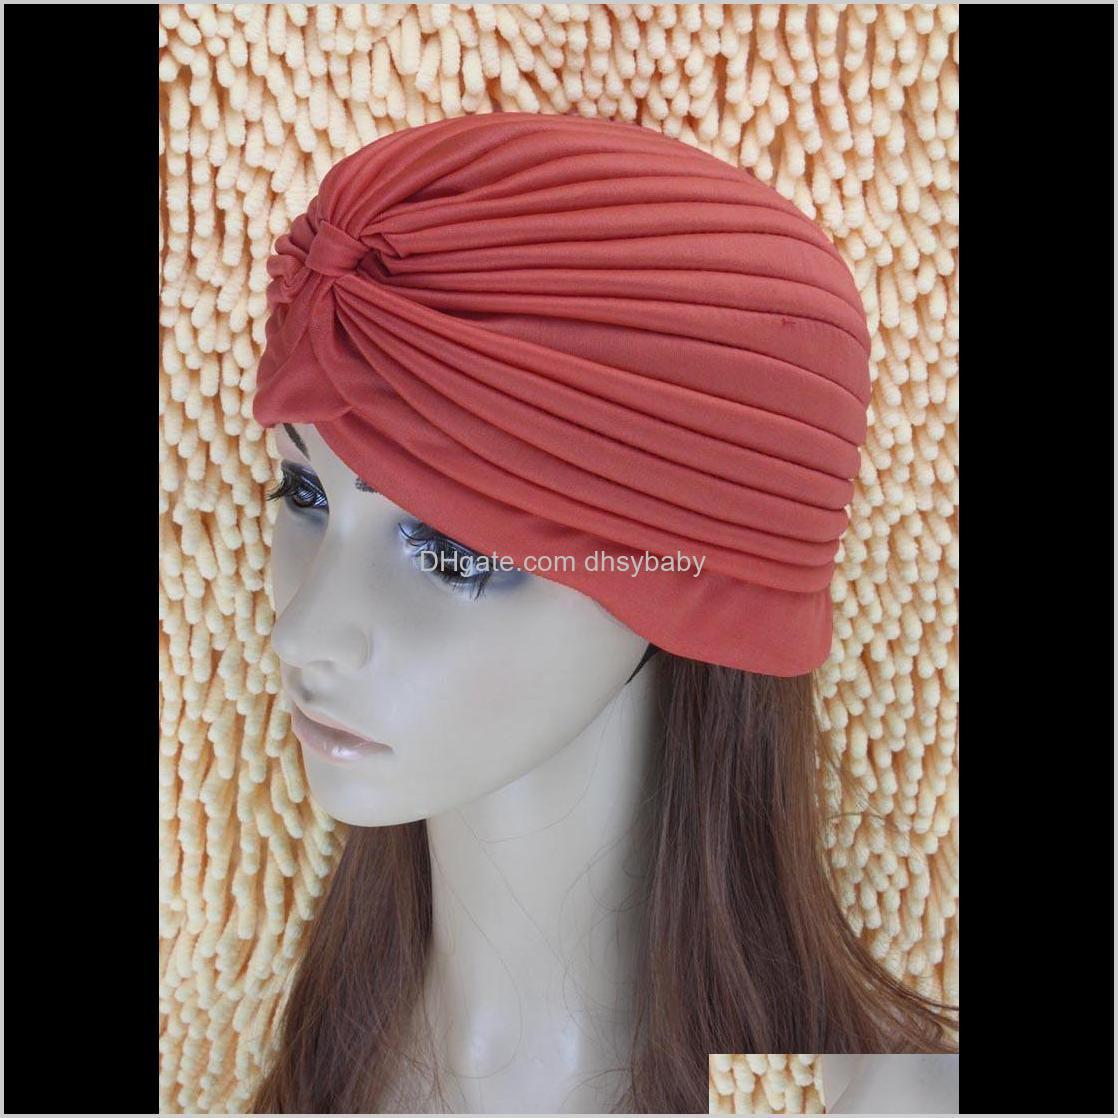 retro women hijab bandana headwear indian headband caps turban hat ear cap solid pleated ladies kerchief shower hat beanies